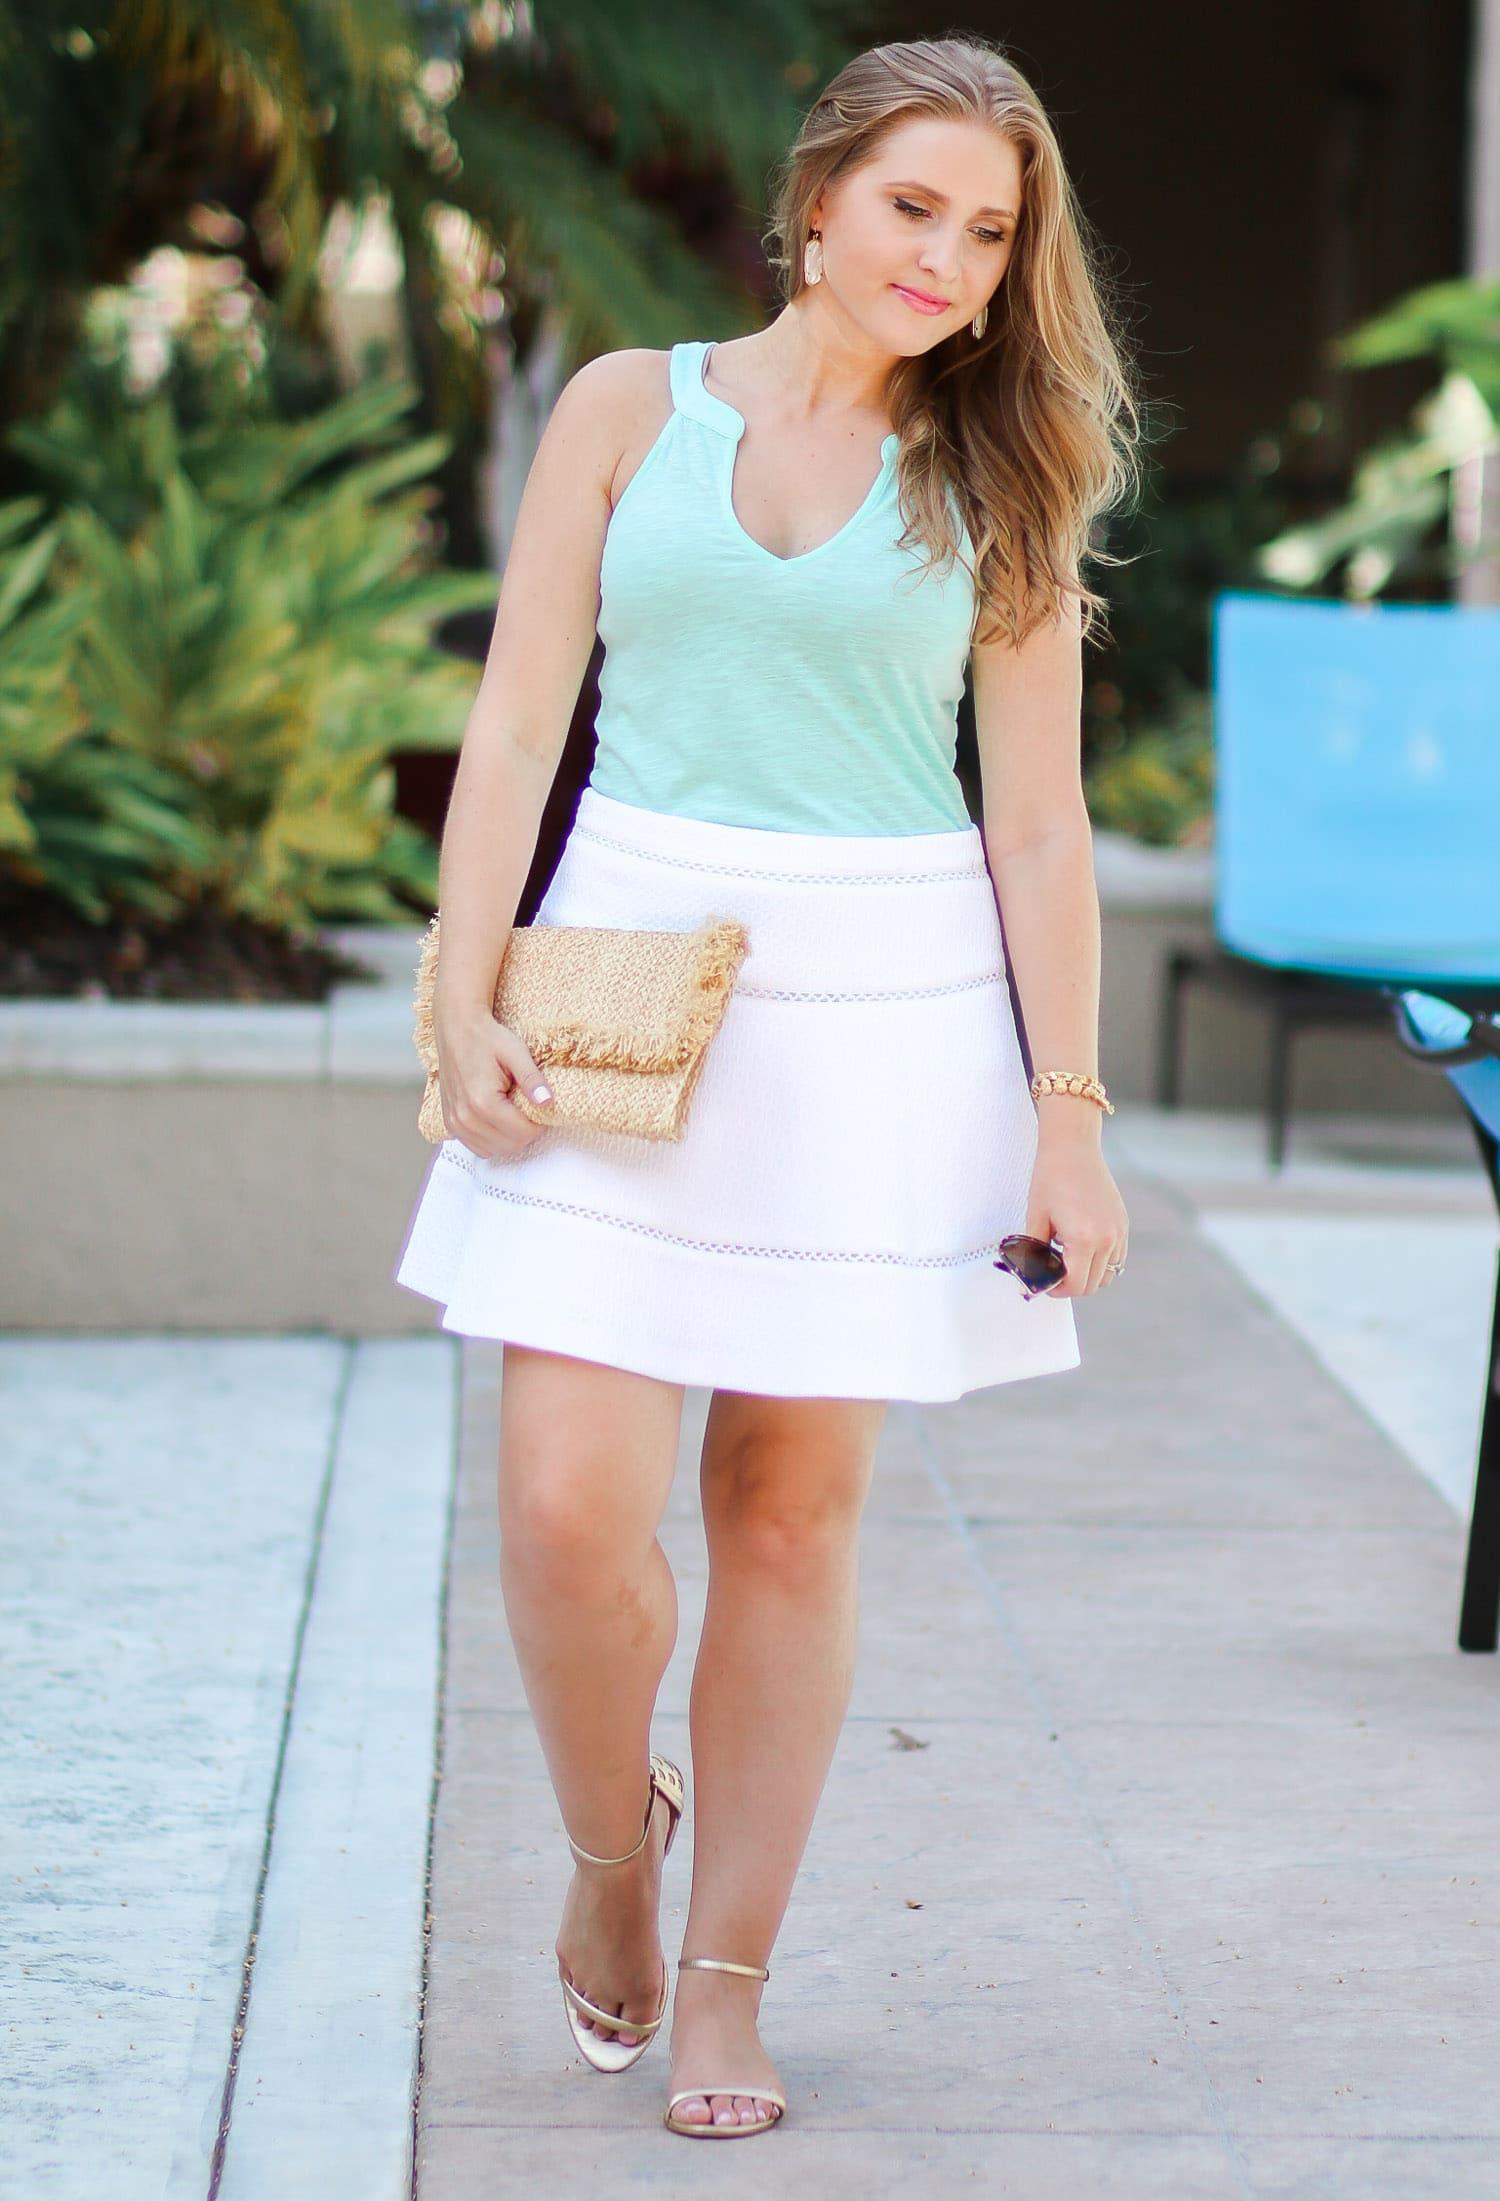 lilly-pulitzer-arya-gold-pineapple-sandals-quay-my-girl-sunglasses-banana-republic-white-skirt-ashley-brooke-3118